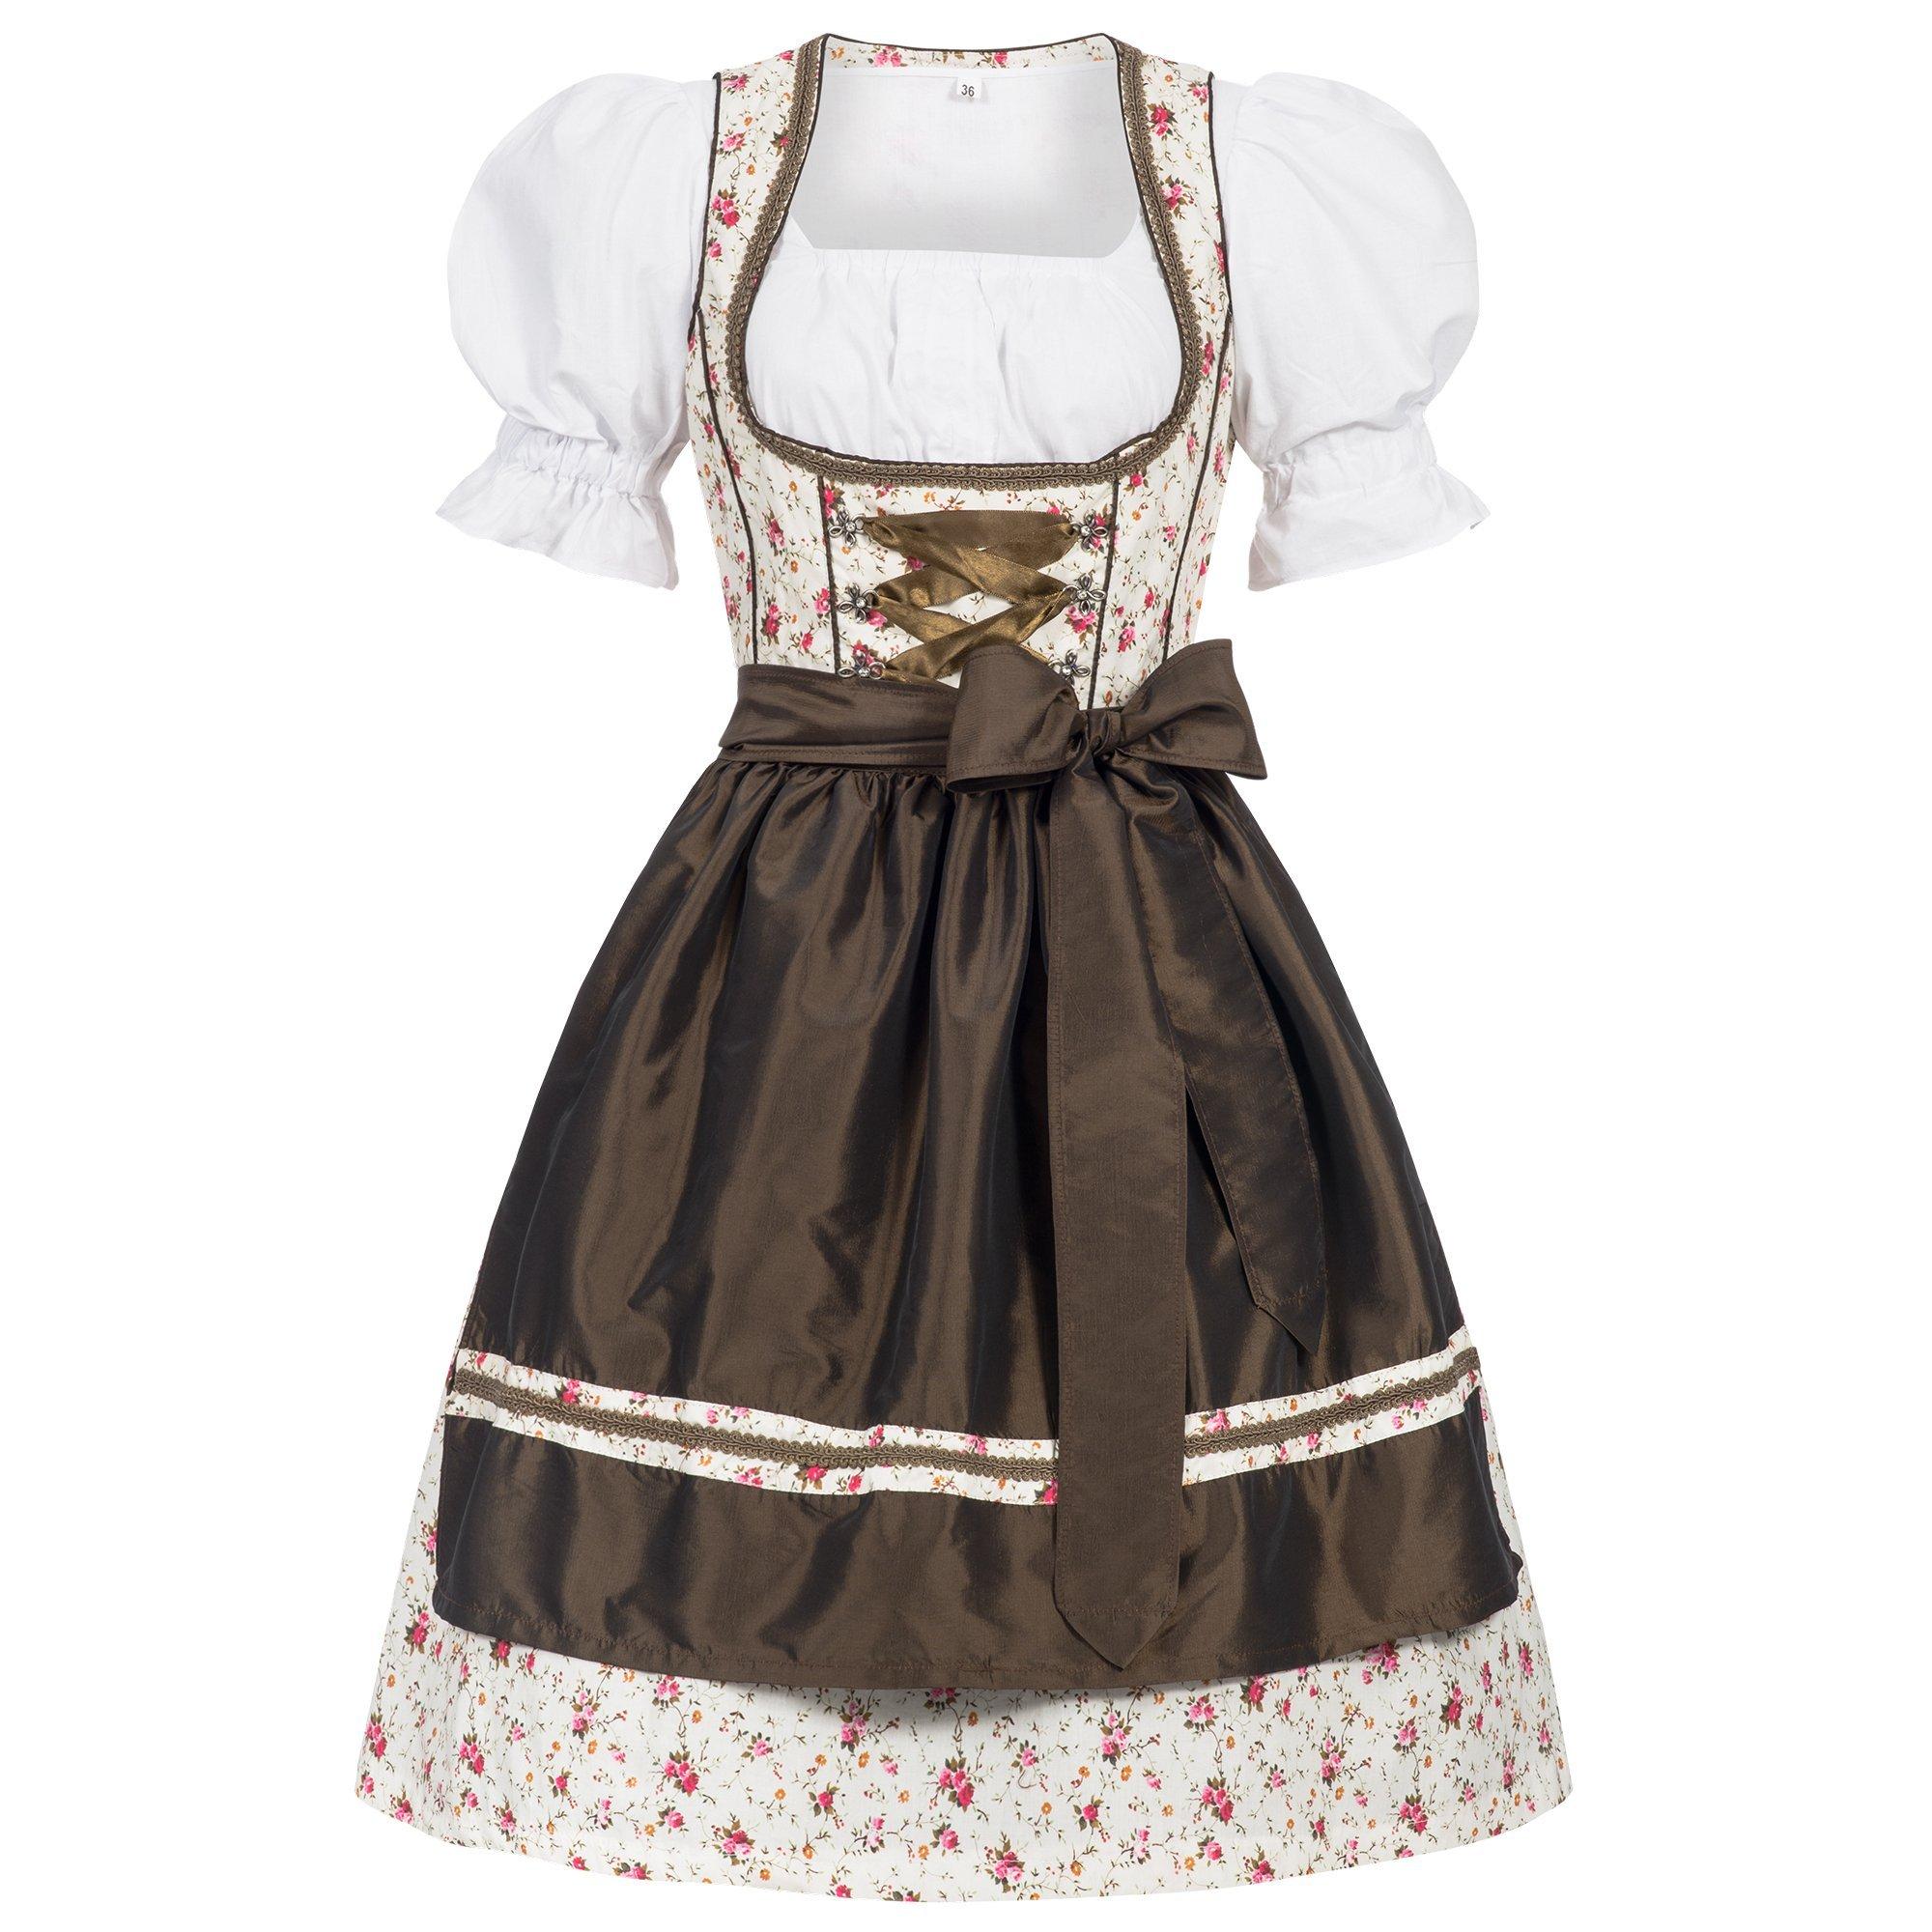 Women's German Dirndl Dress Costumes for Bavarian Oktoberfest Carnival Halloween Erna 46